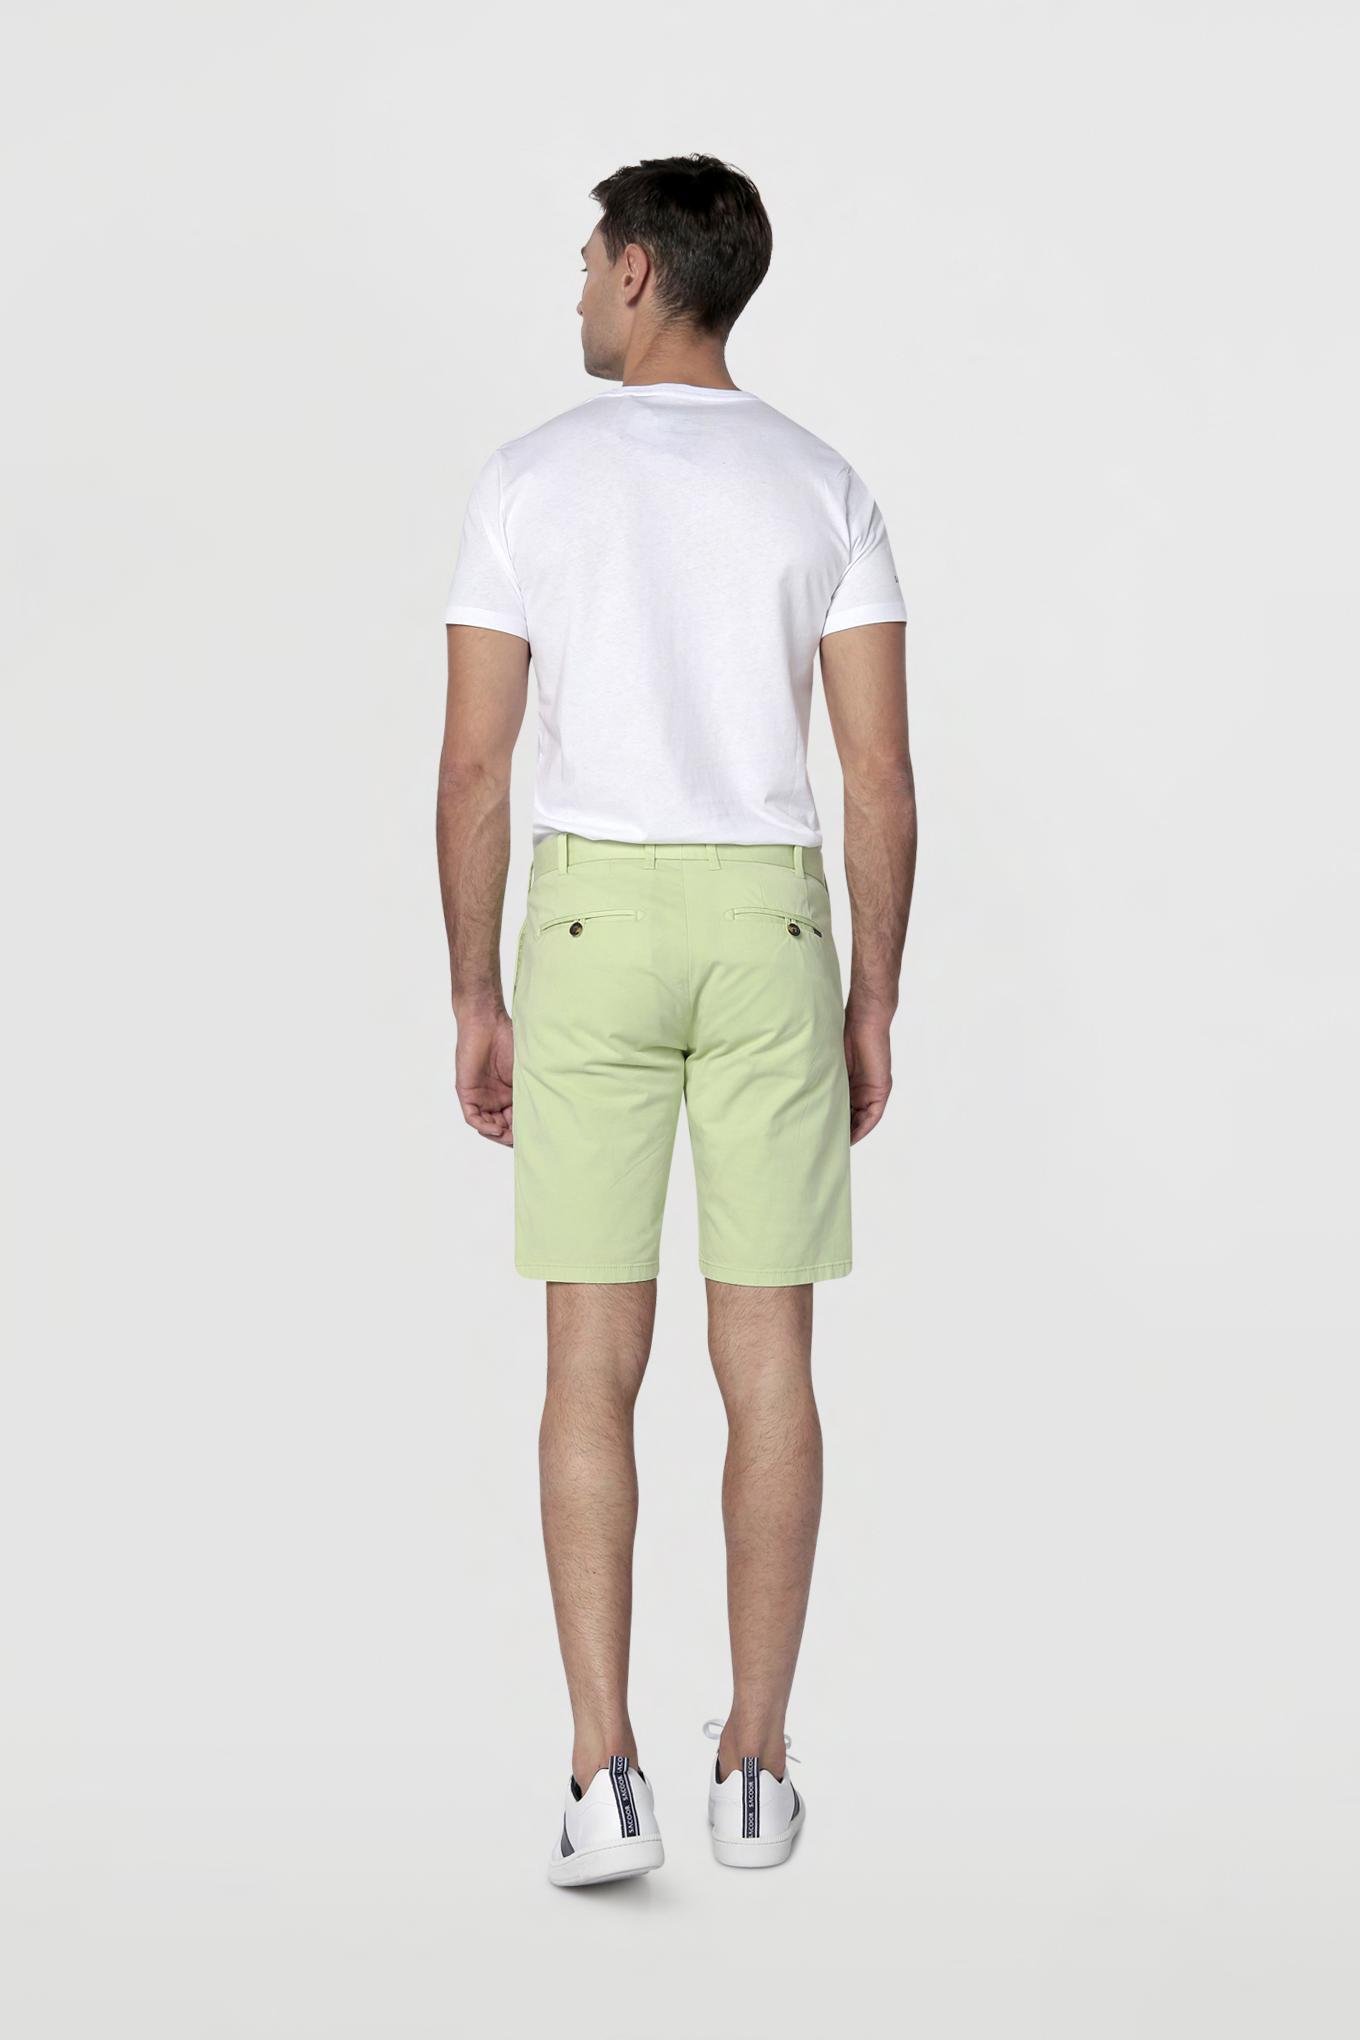 Bermuda Light Green Casual Man